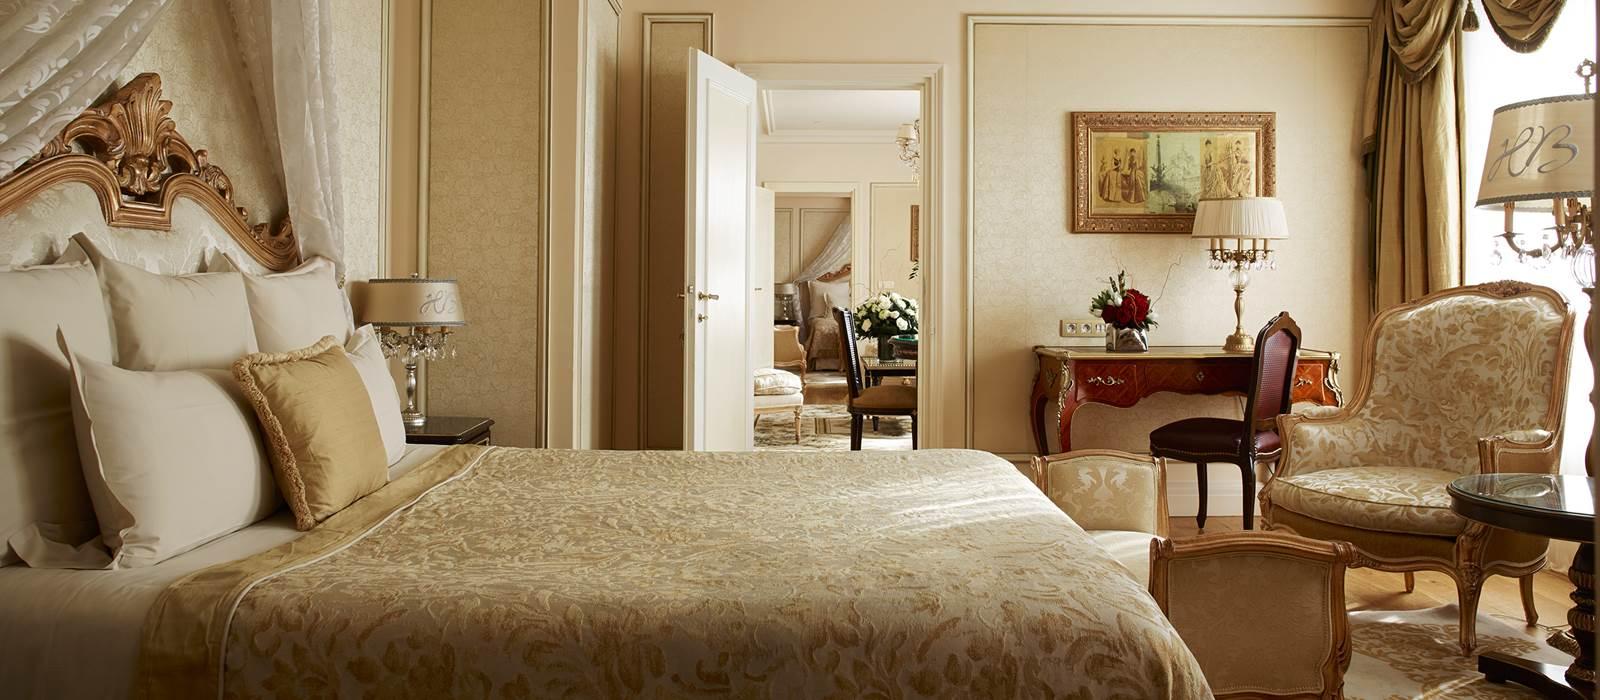 Royal Suite Hotel Balzac